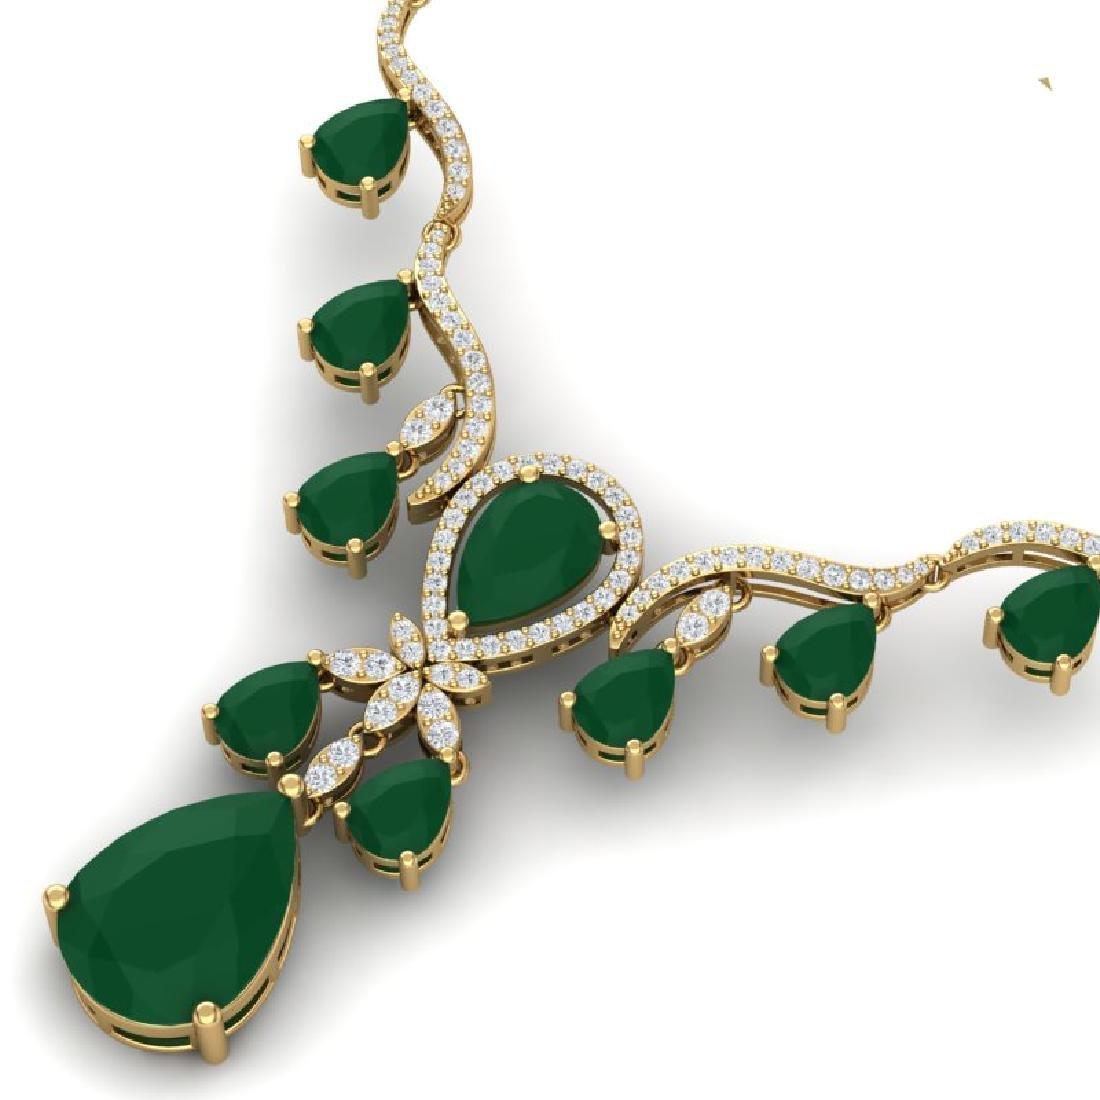 36.14 CTW Royalty Emerald & VS Diamond Necklace 18K - 2